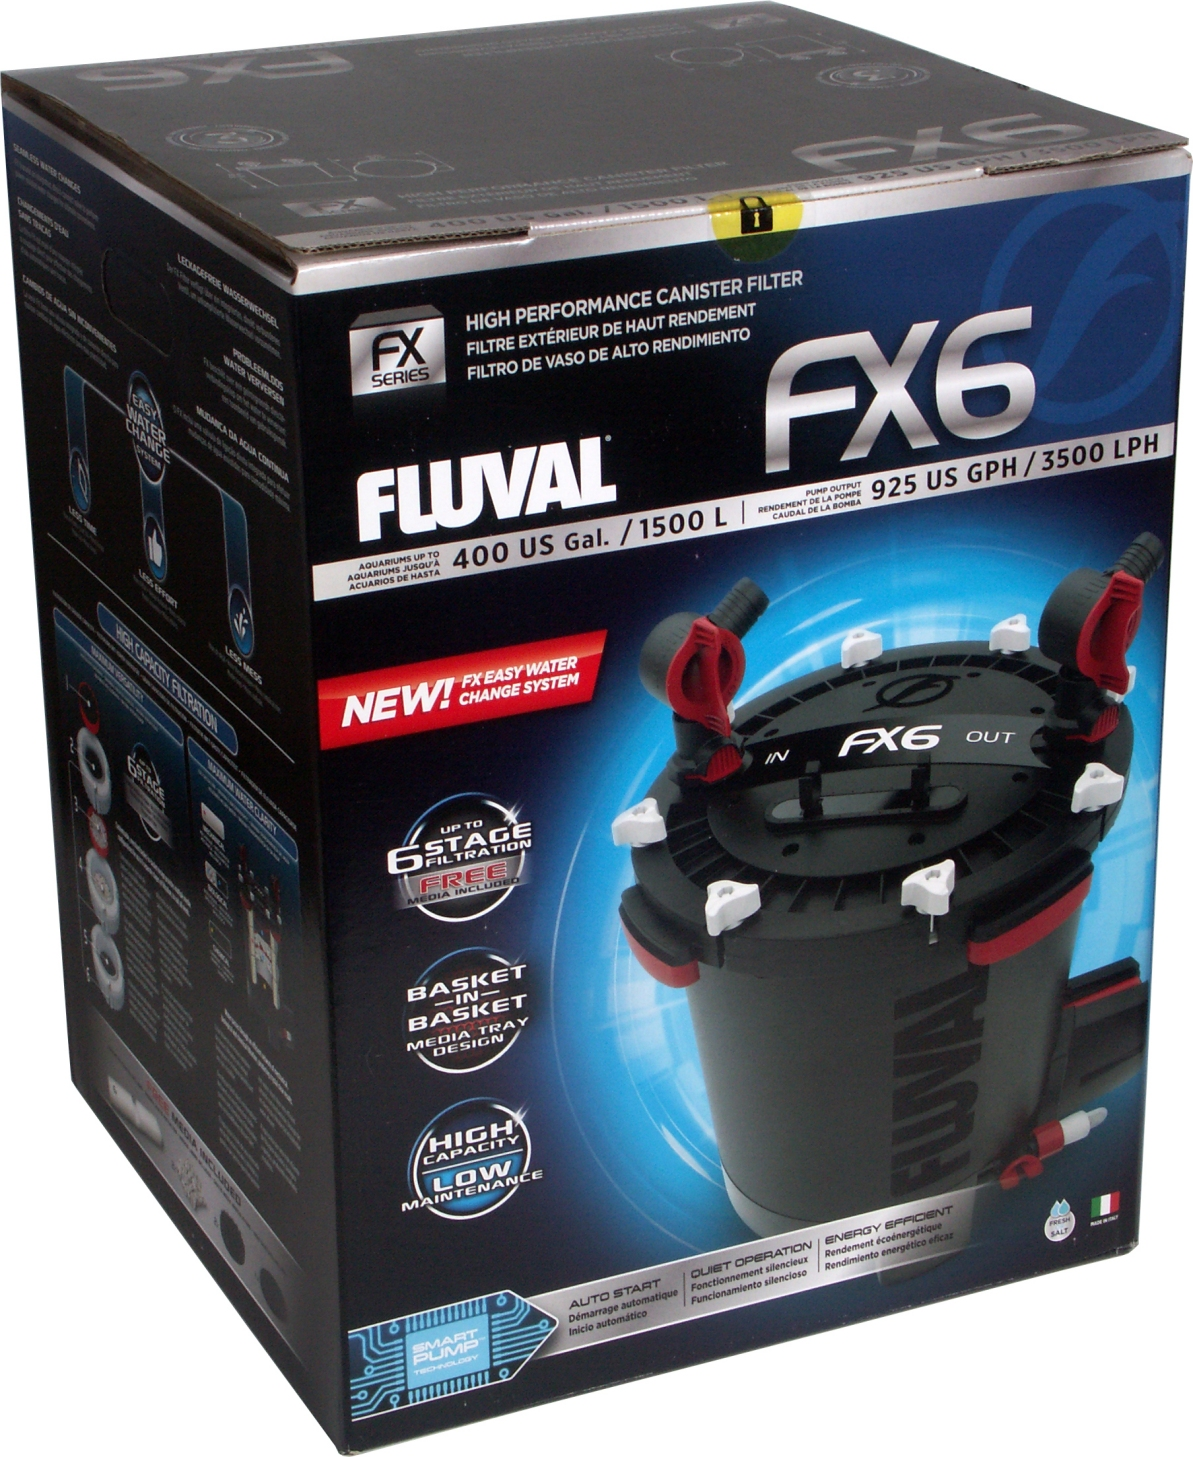 HAGEN FLUVAL FX6 FILTR ZEWNĘTRZNY + GRATISY